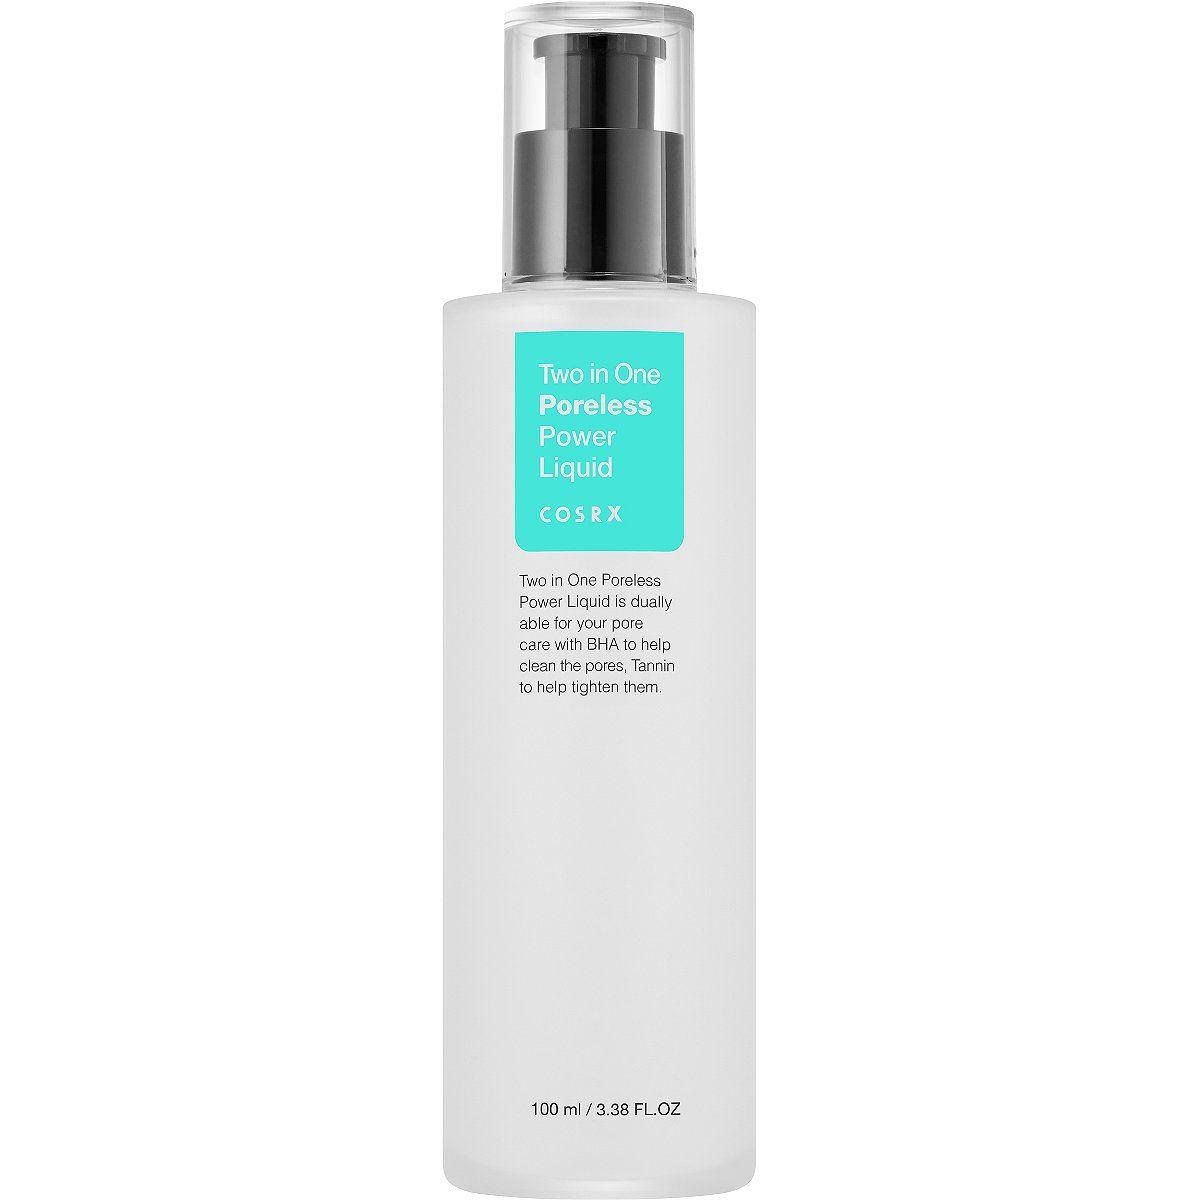 Cosrx Online Only Two In One Poreless Power Liquid Ulta Beauty Skin Care Skin Care Secrets Poreless Skin